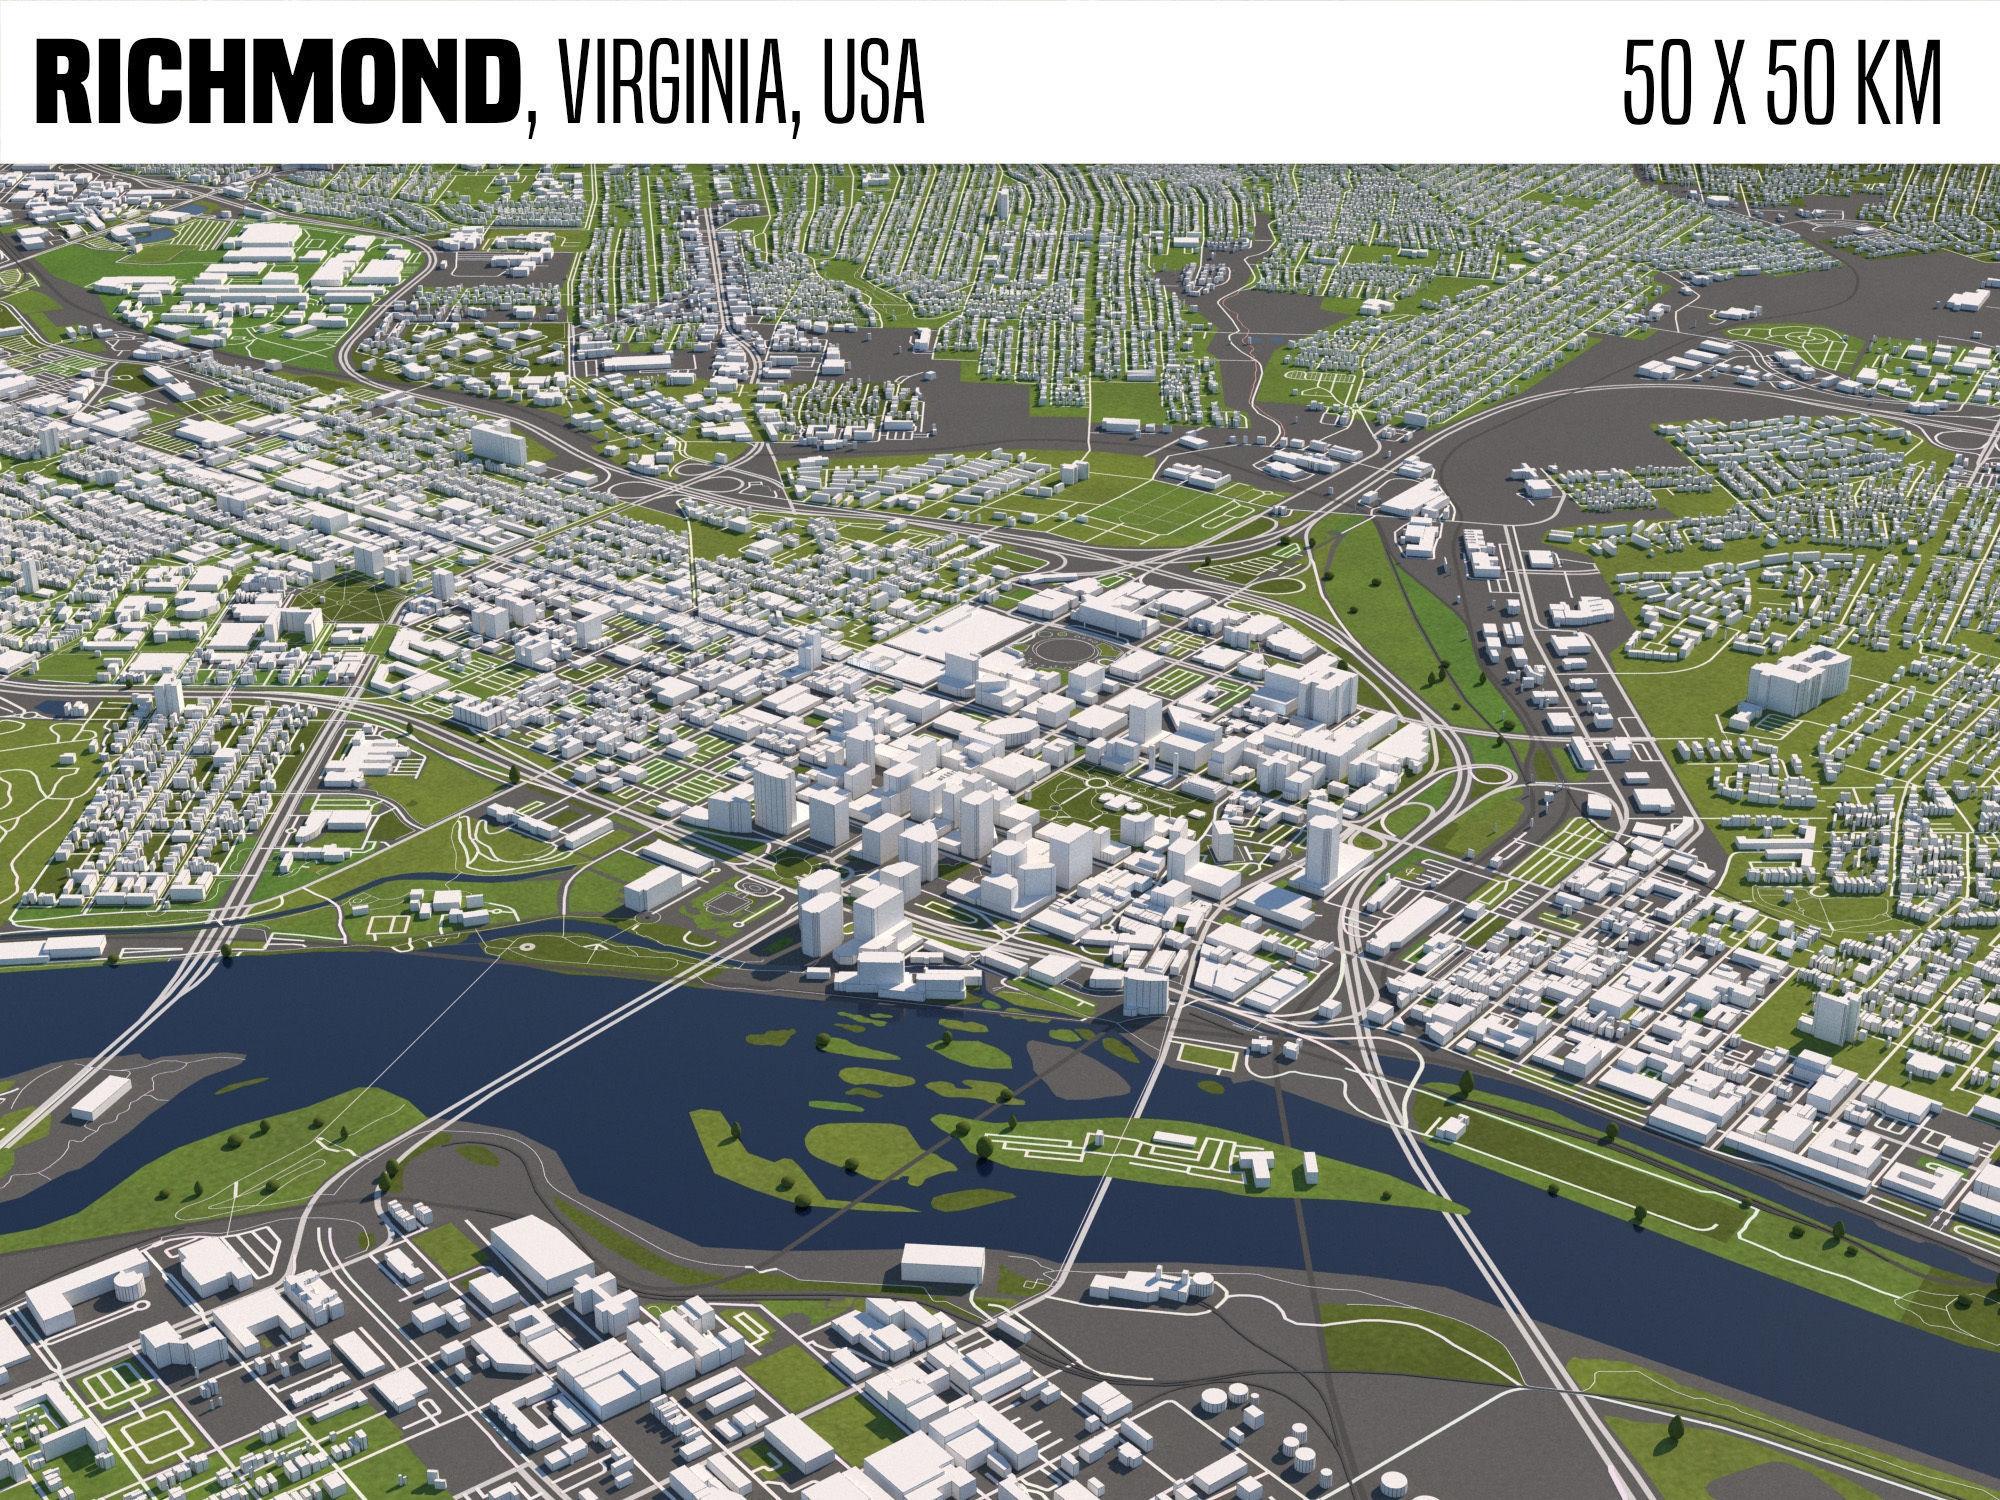 Richmond Virginia USA 50x50km